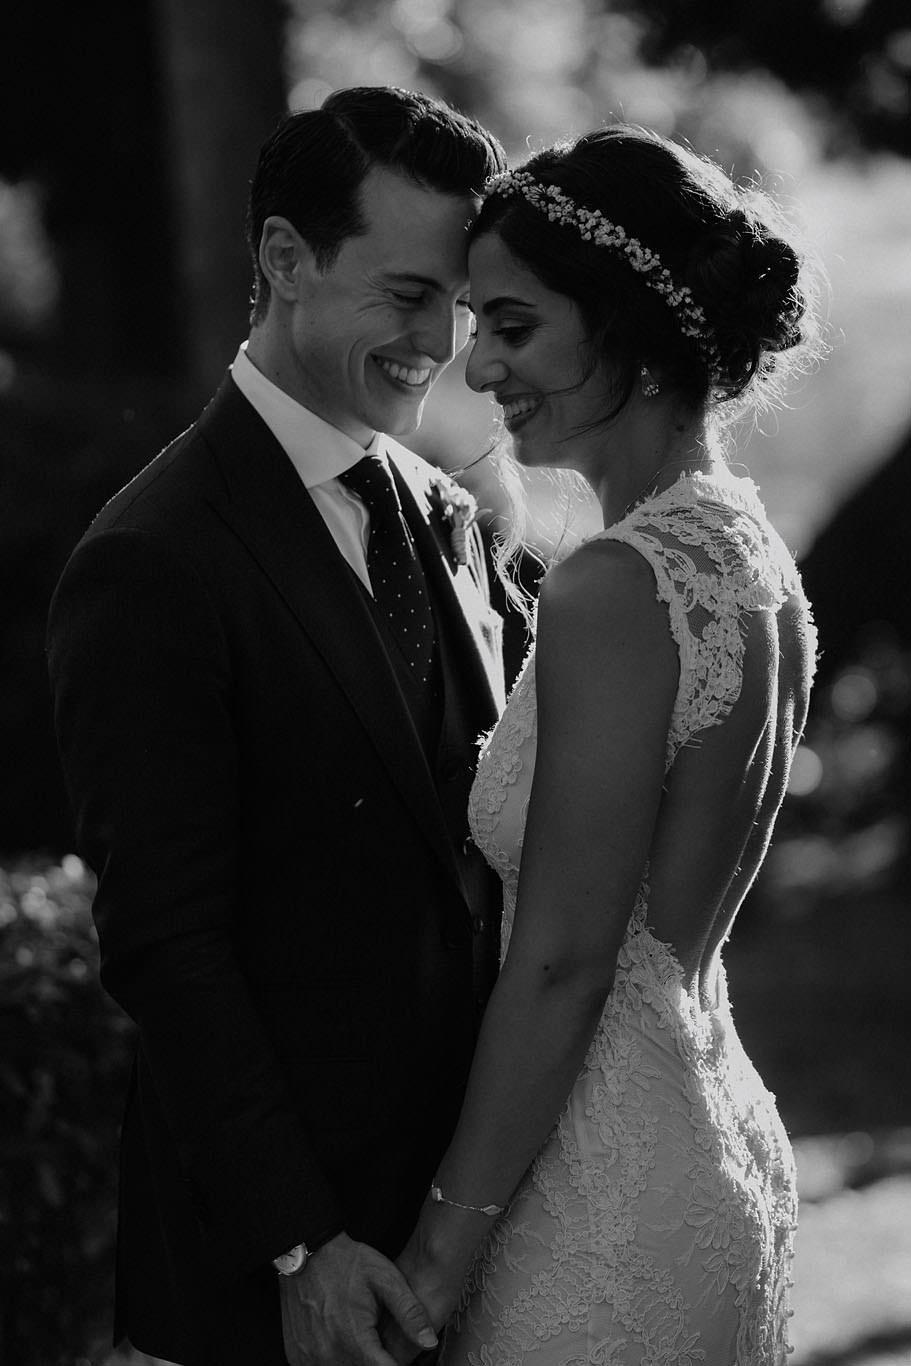 Max-Steph-Italy-Wedding-526.jpg